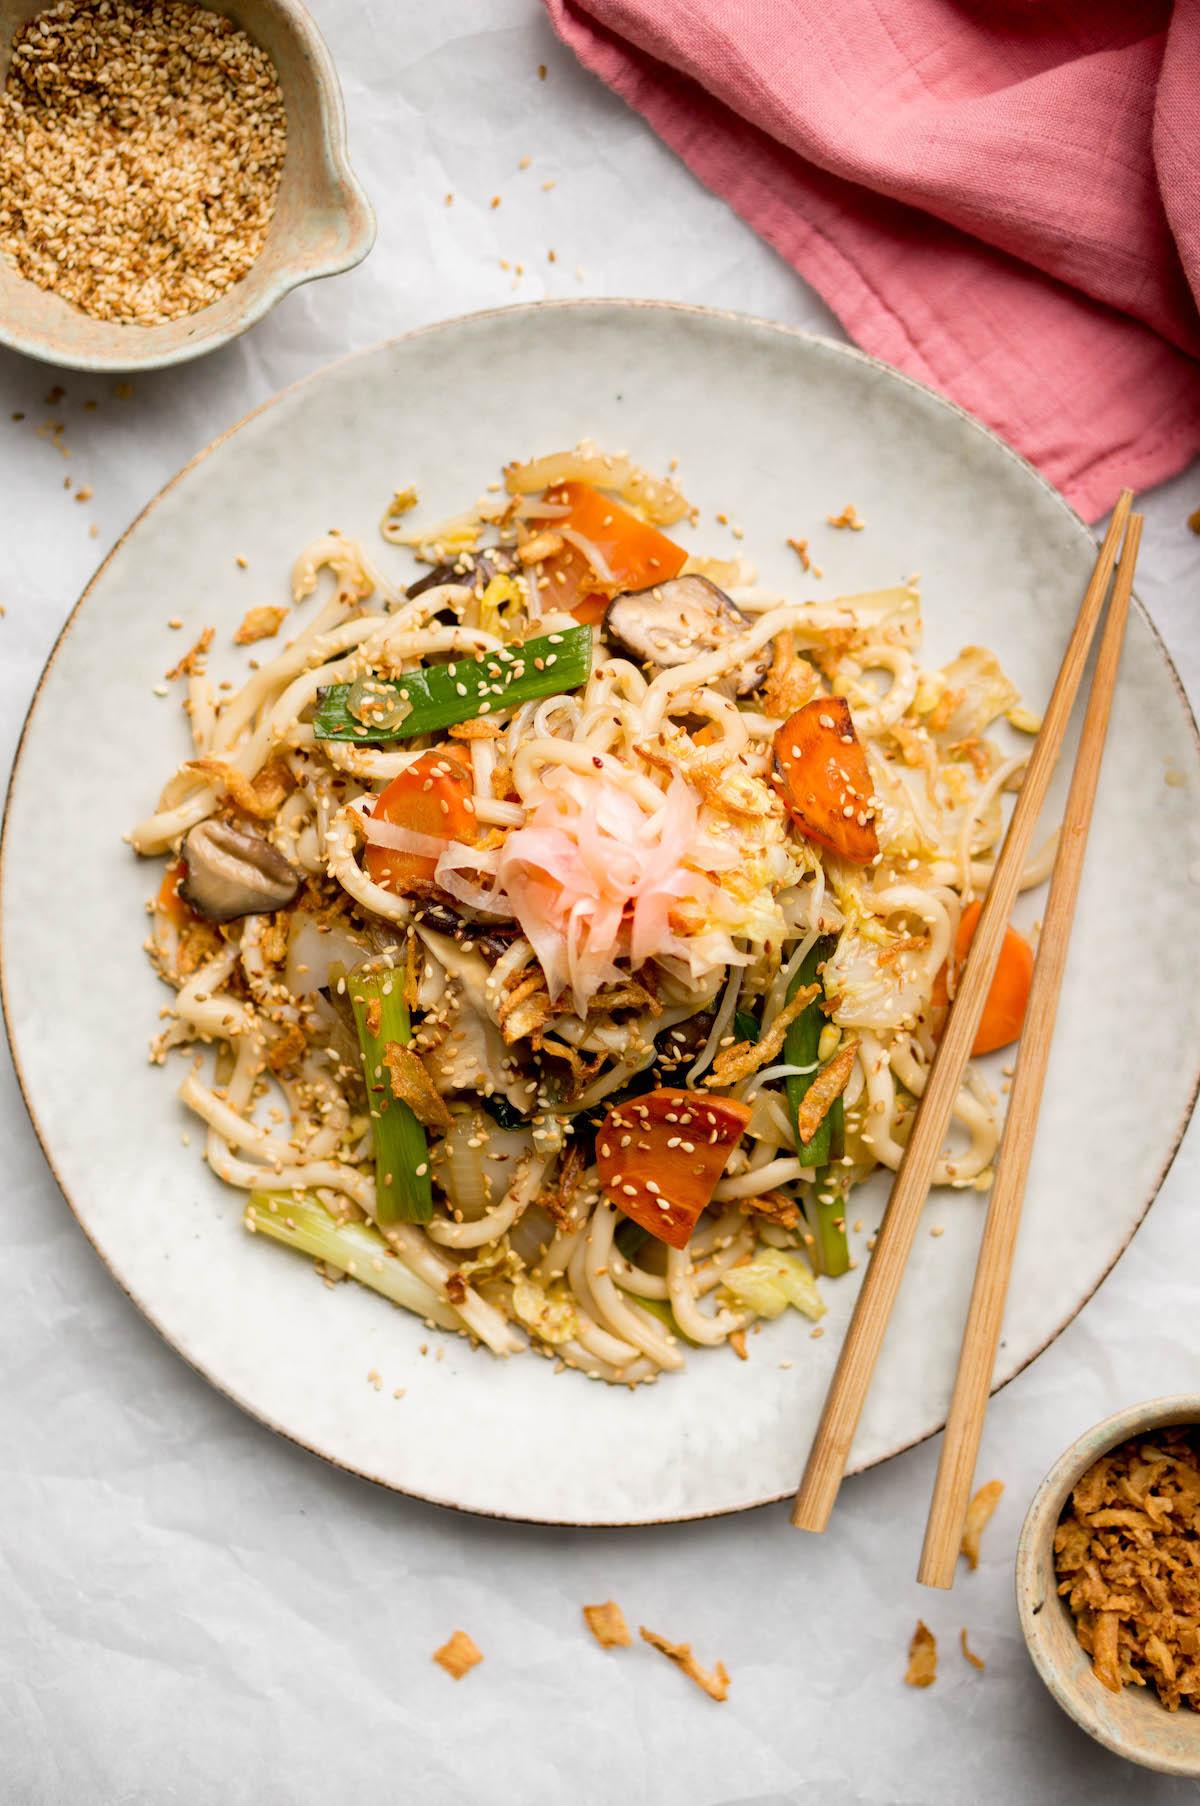 Afbeelding van Japanse udon noodles